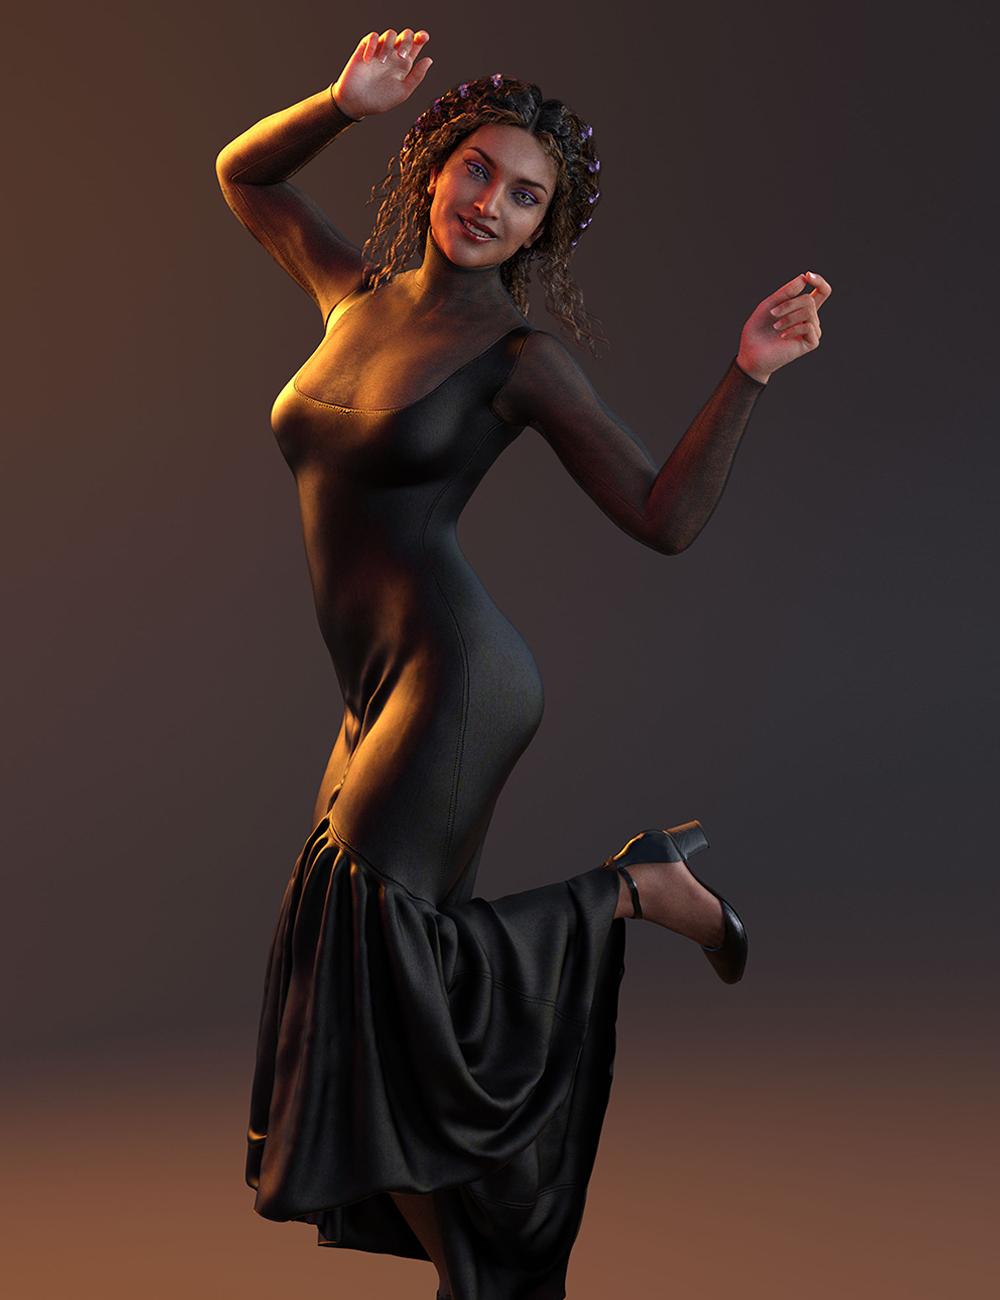 dForce Flare Dress for Genesis 8 Females by: Lyrra MadrilMoonscape GraphicsSade, 3D Models by Daz 3D